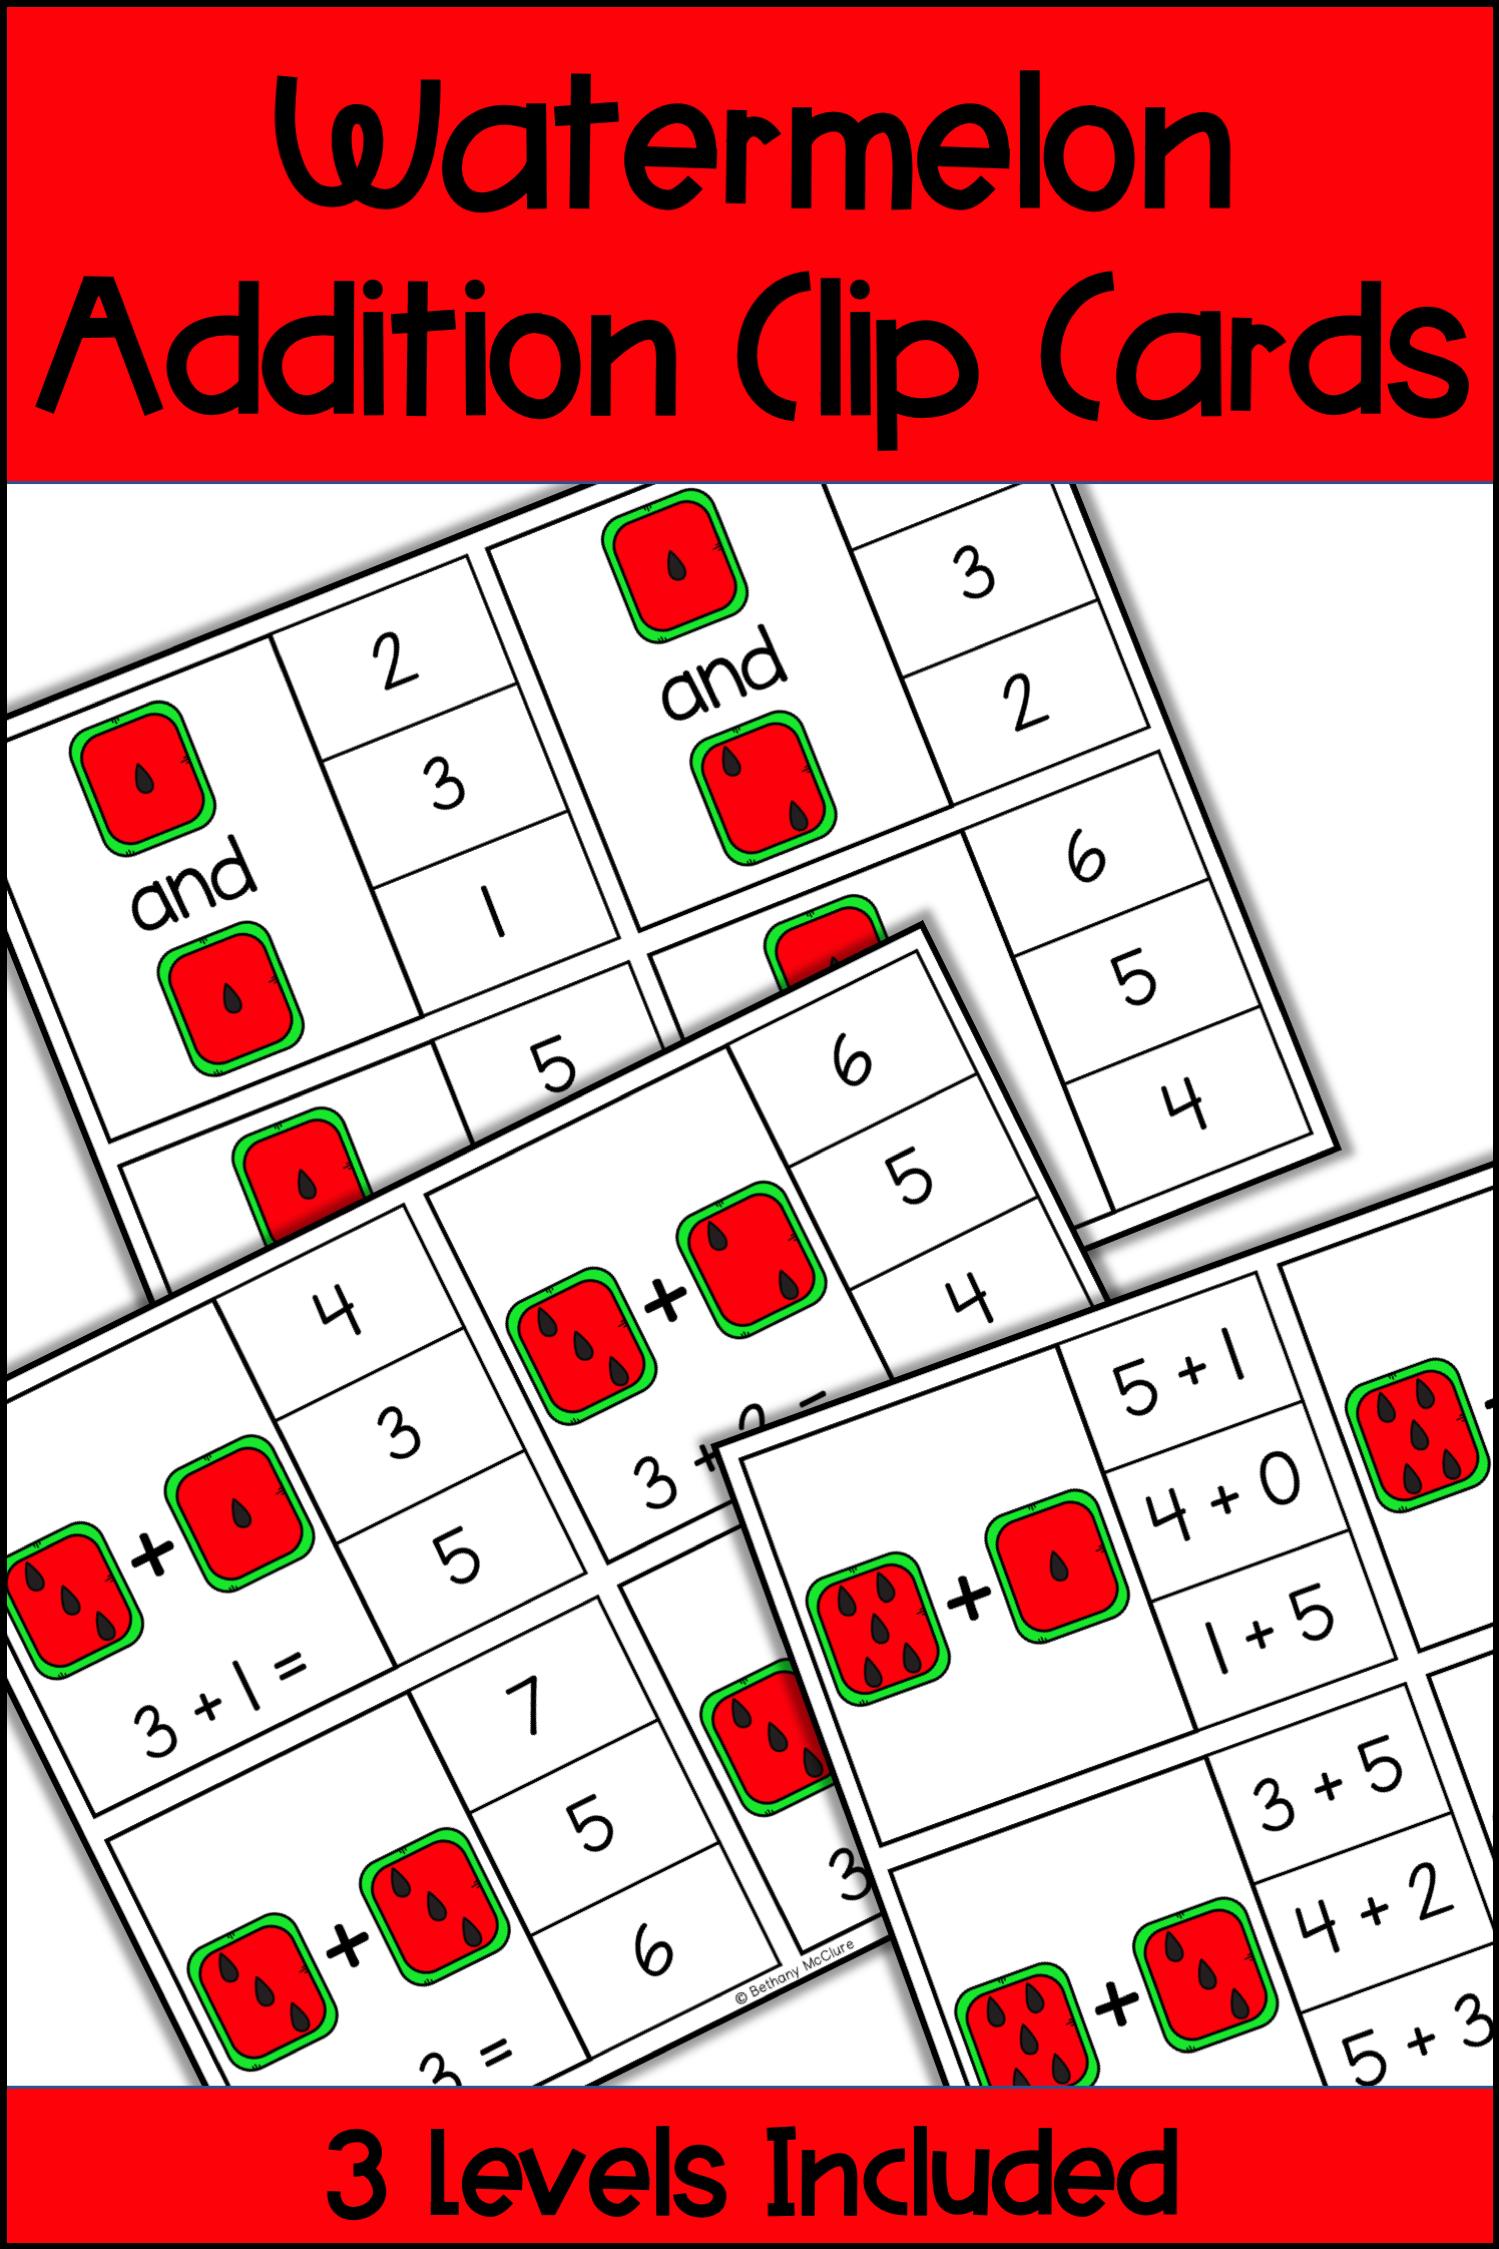 Watermelon Addition Clip Cards